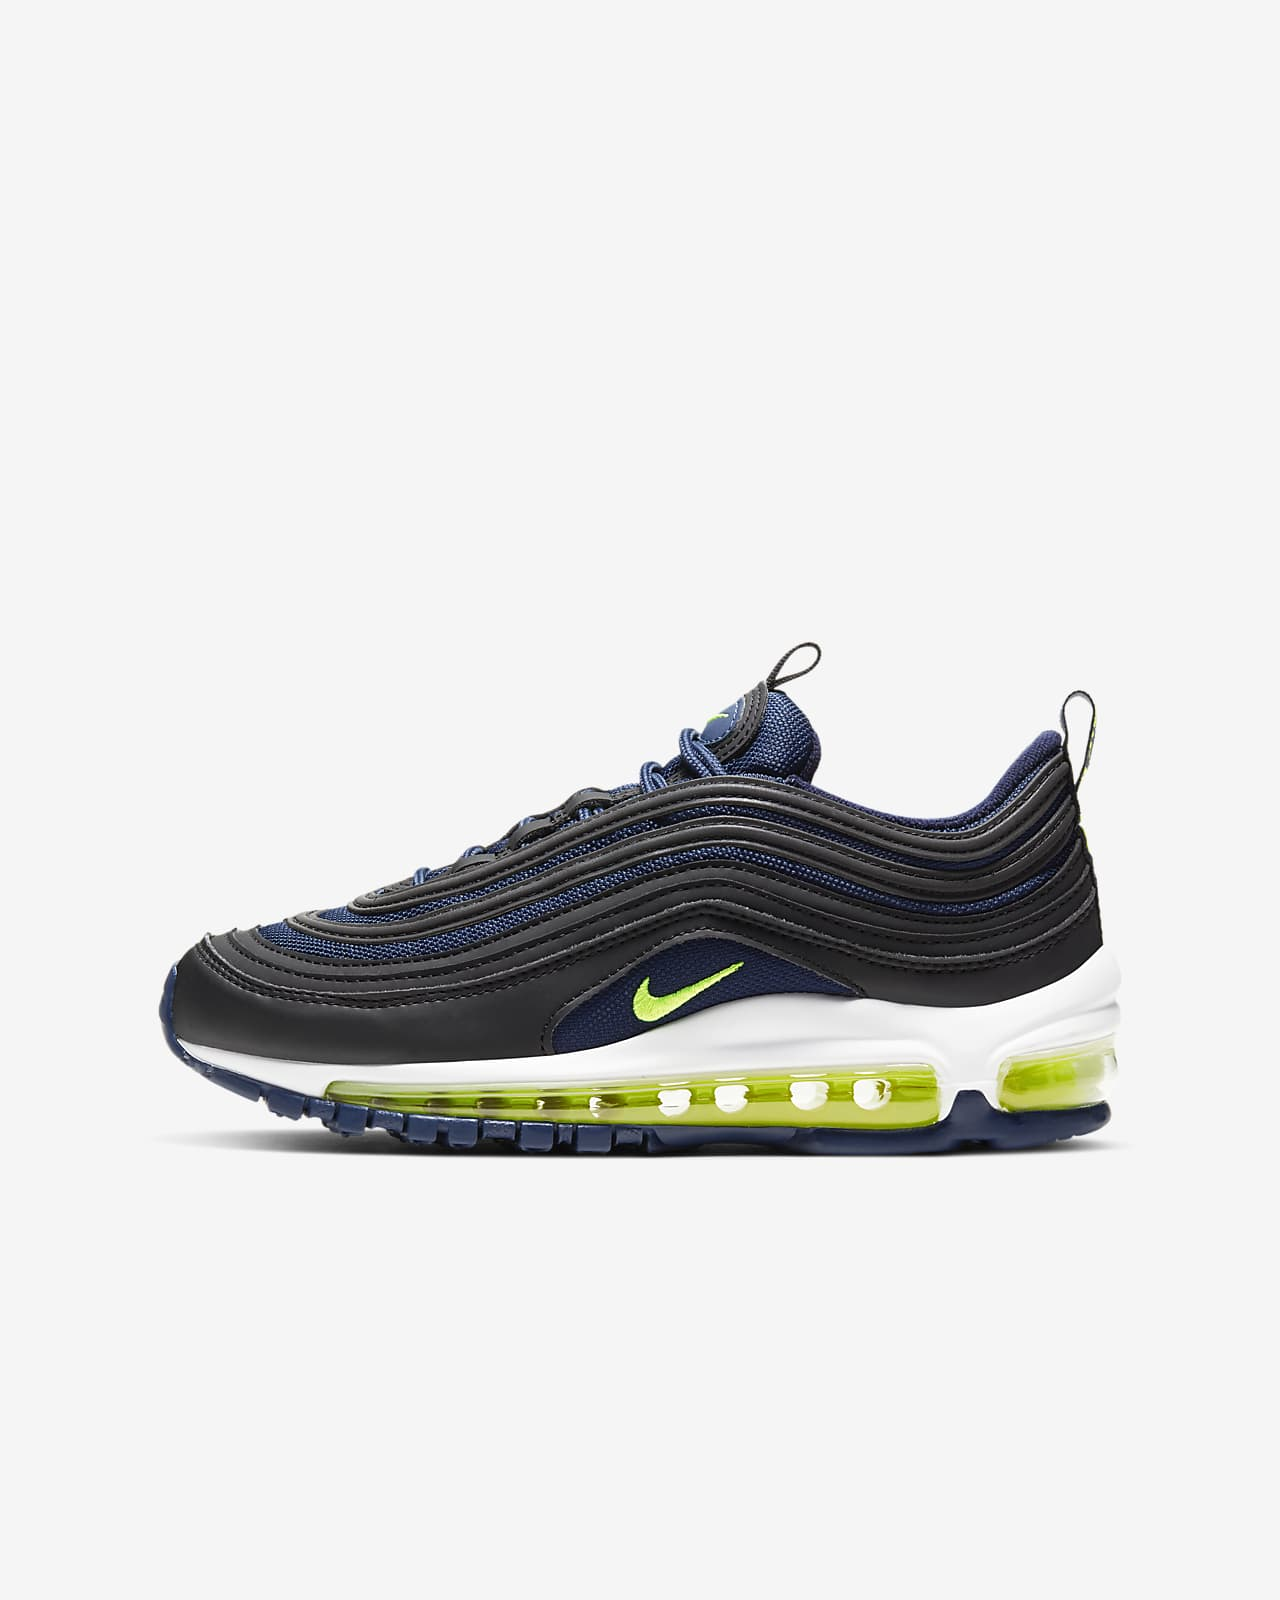 scarpe uomo nike 2018 air max 97